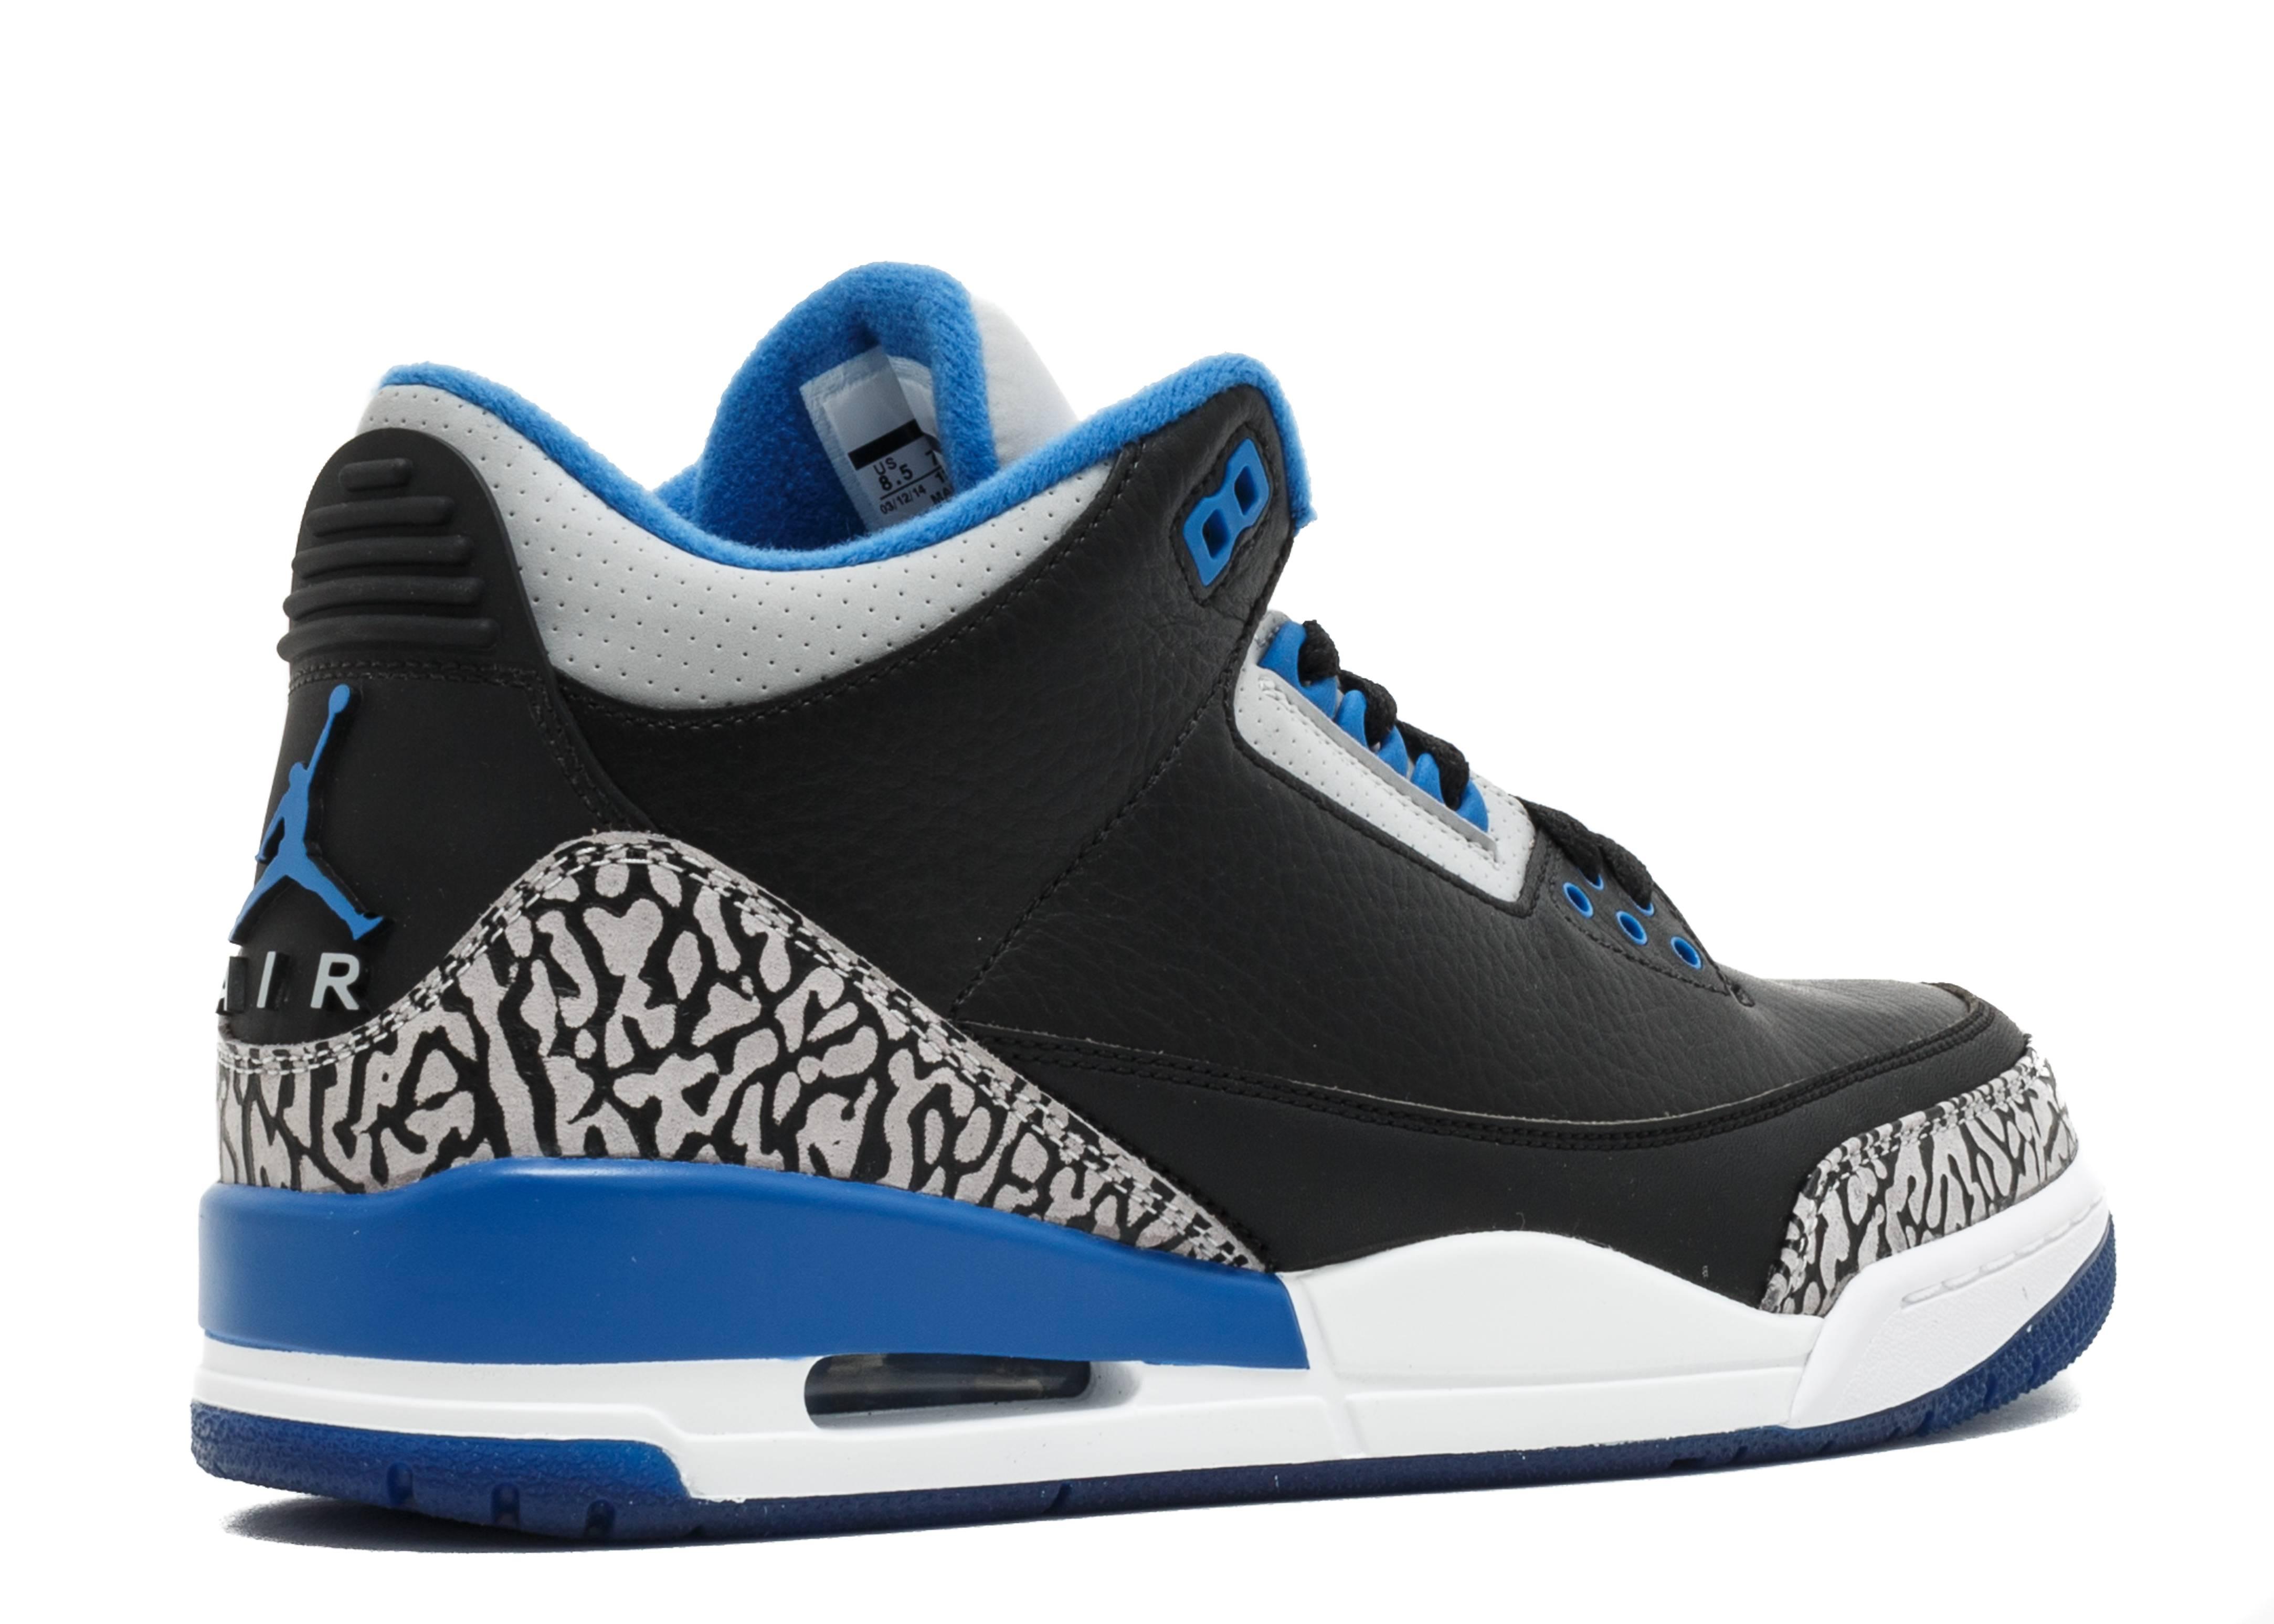 Air Jordan 3 Blue Black